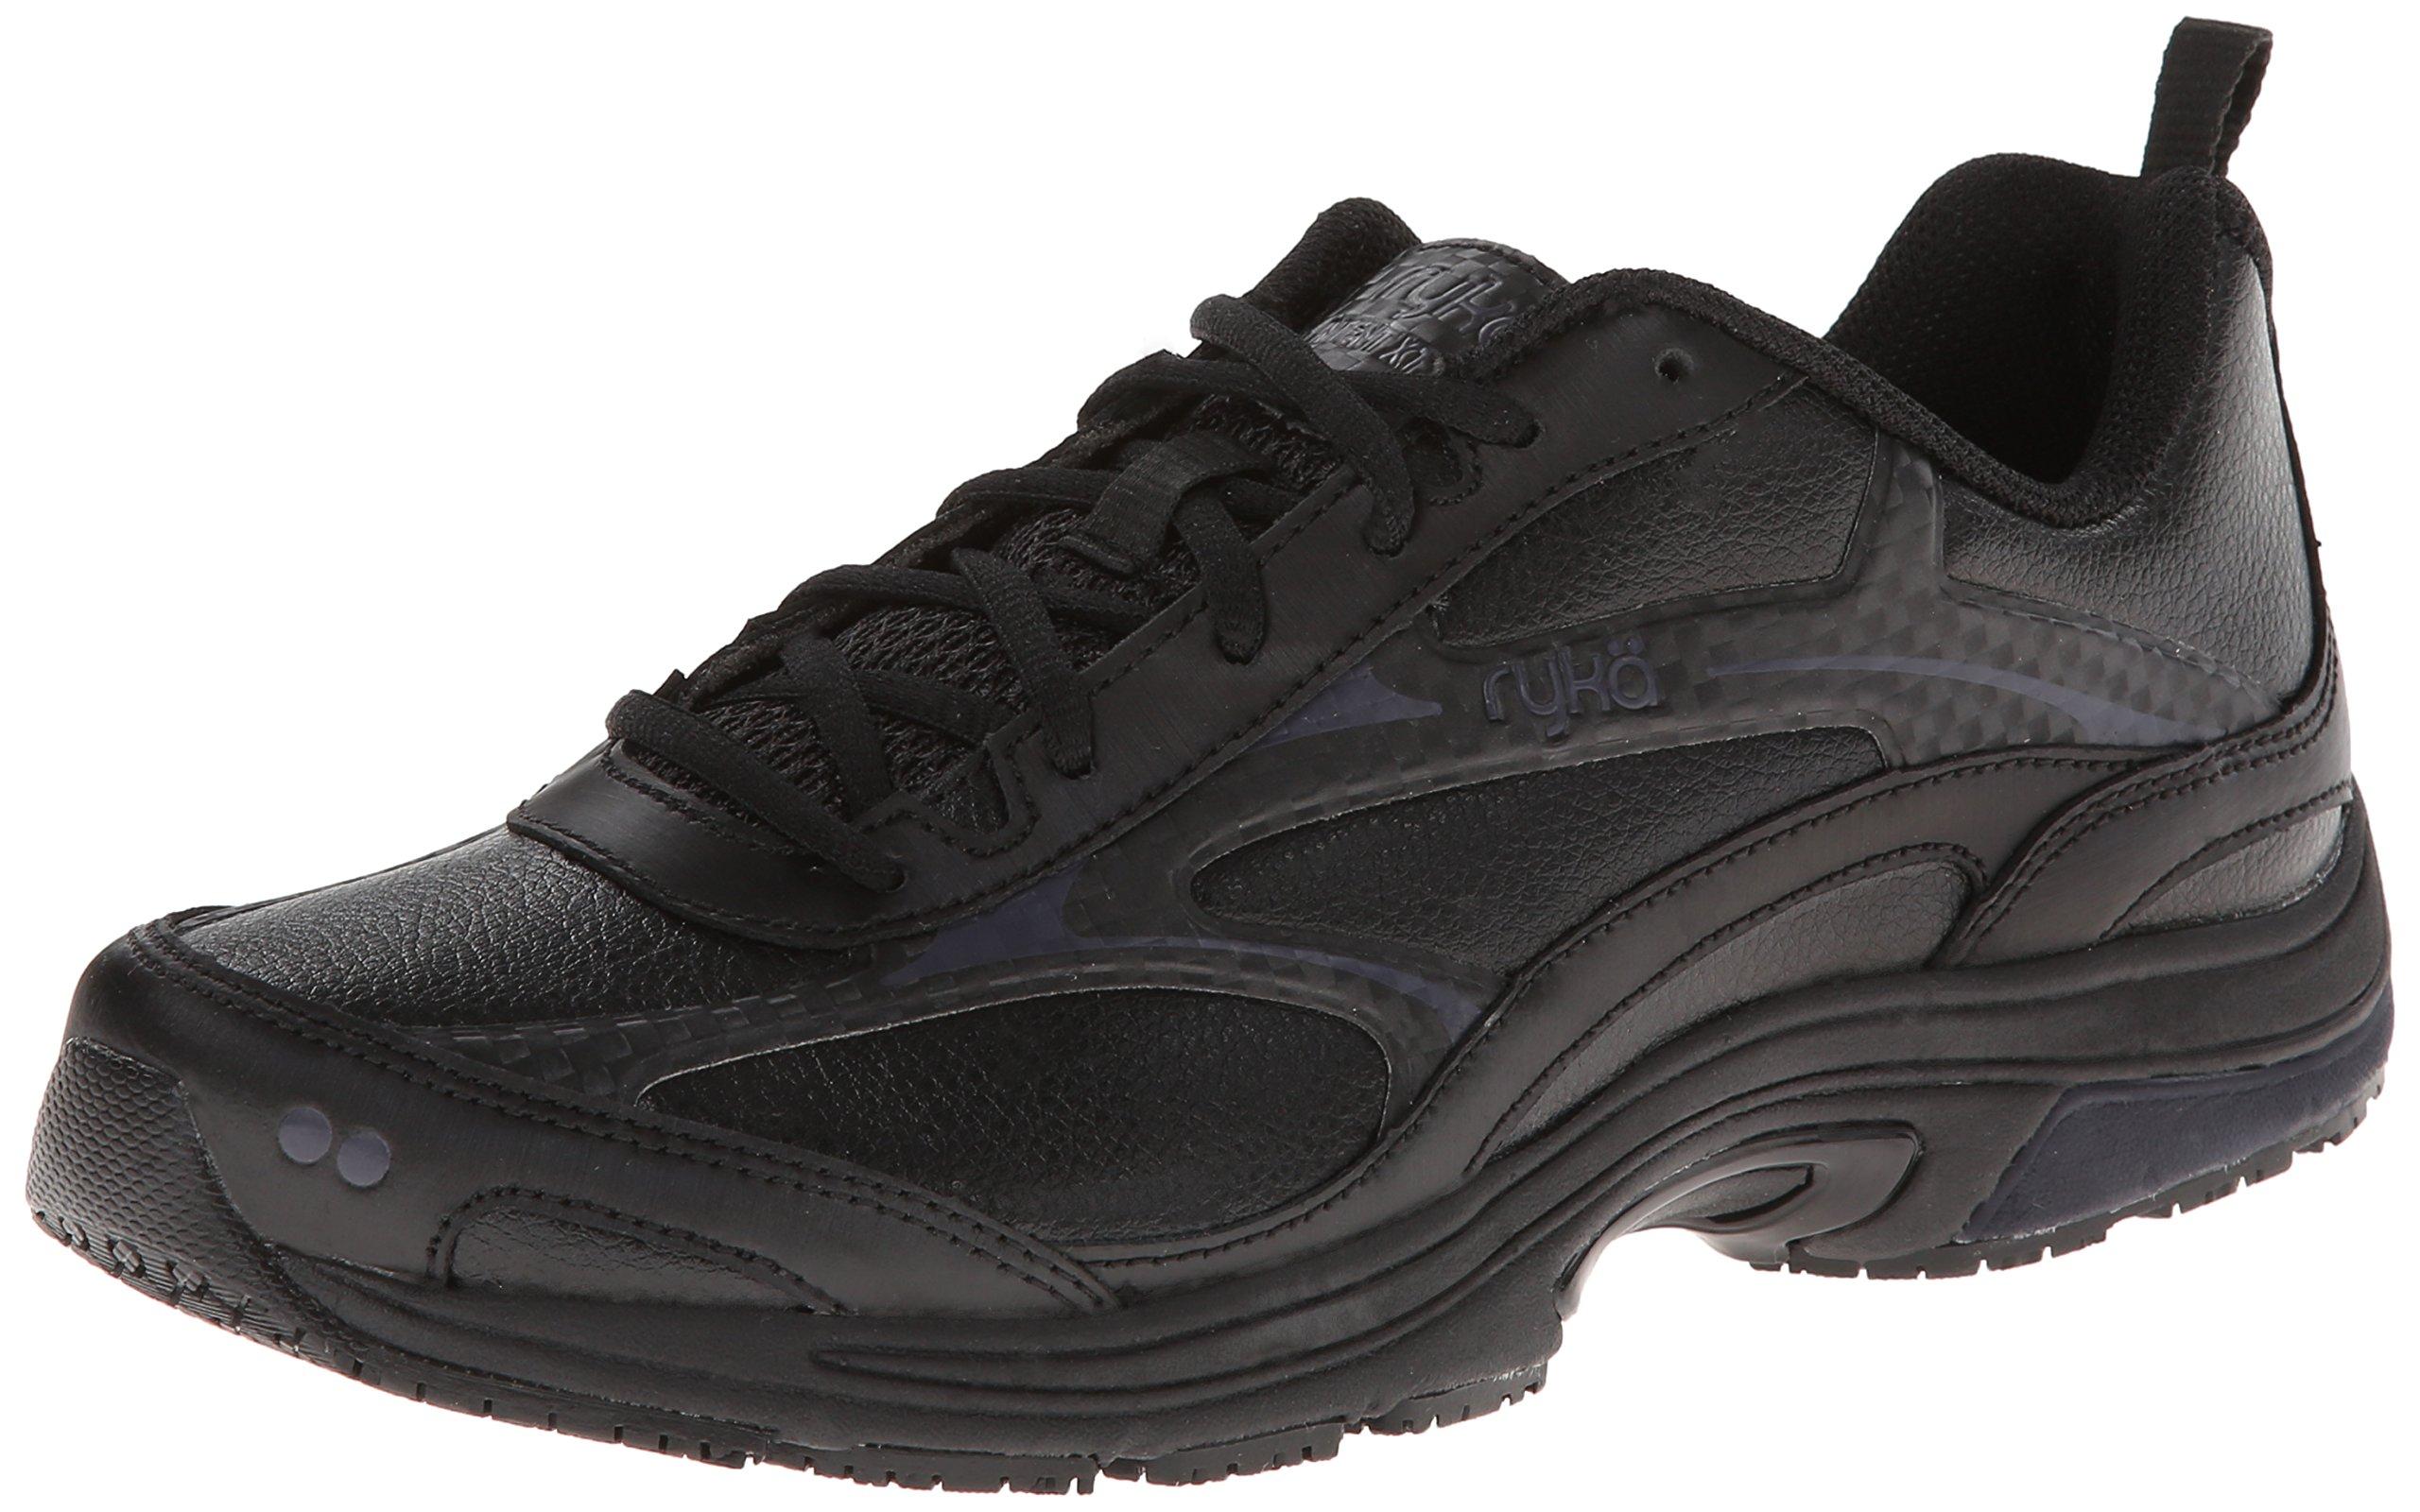 Ryka Women's Intent XT 2 SR Trail Running Shoe,Black/Chrome Silver,9 M US